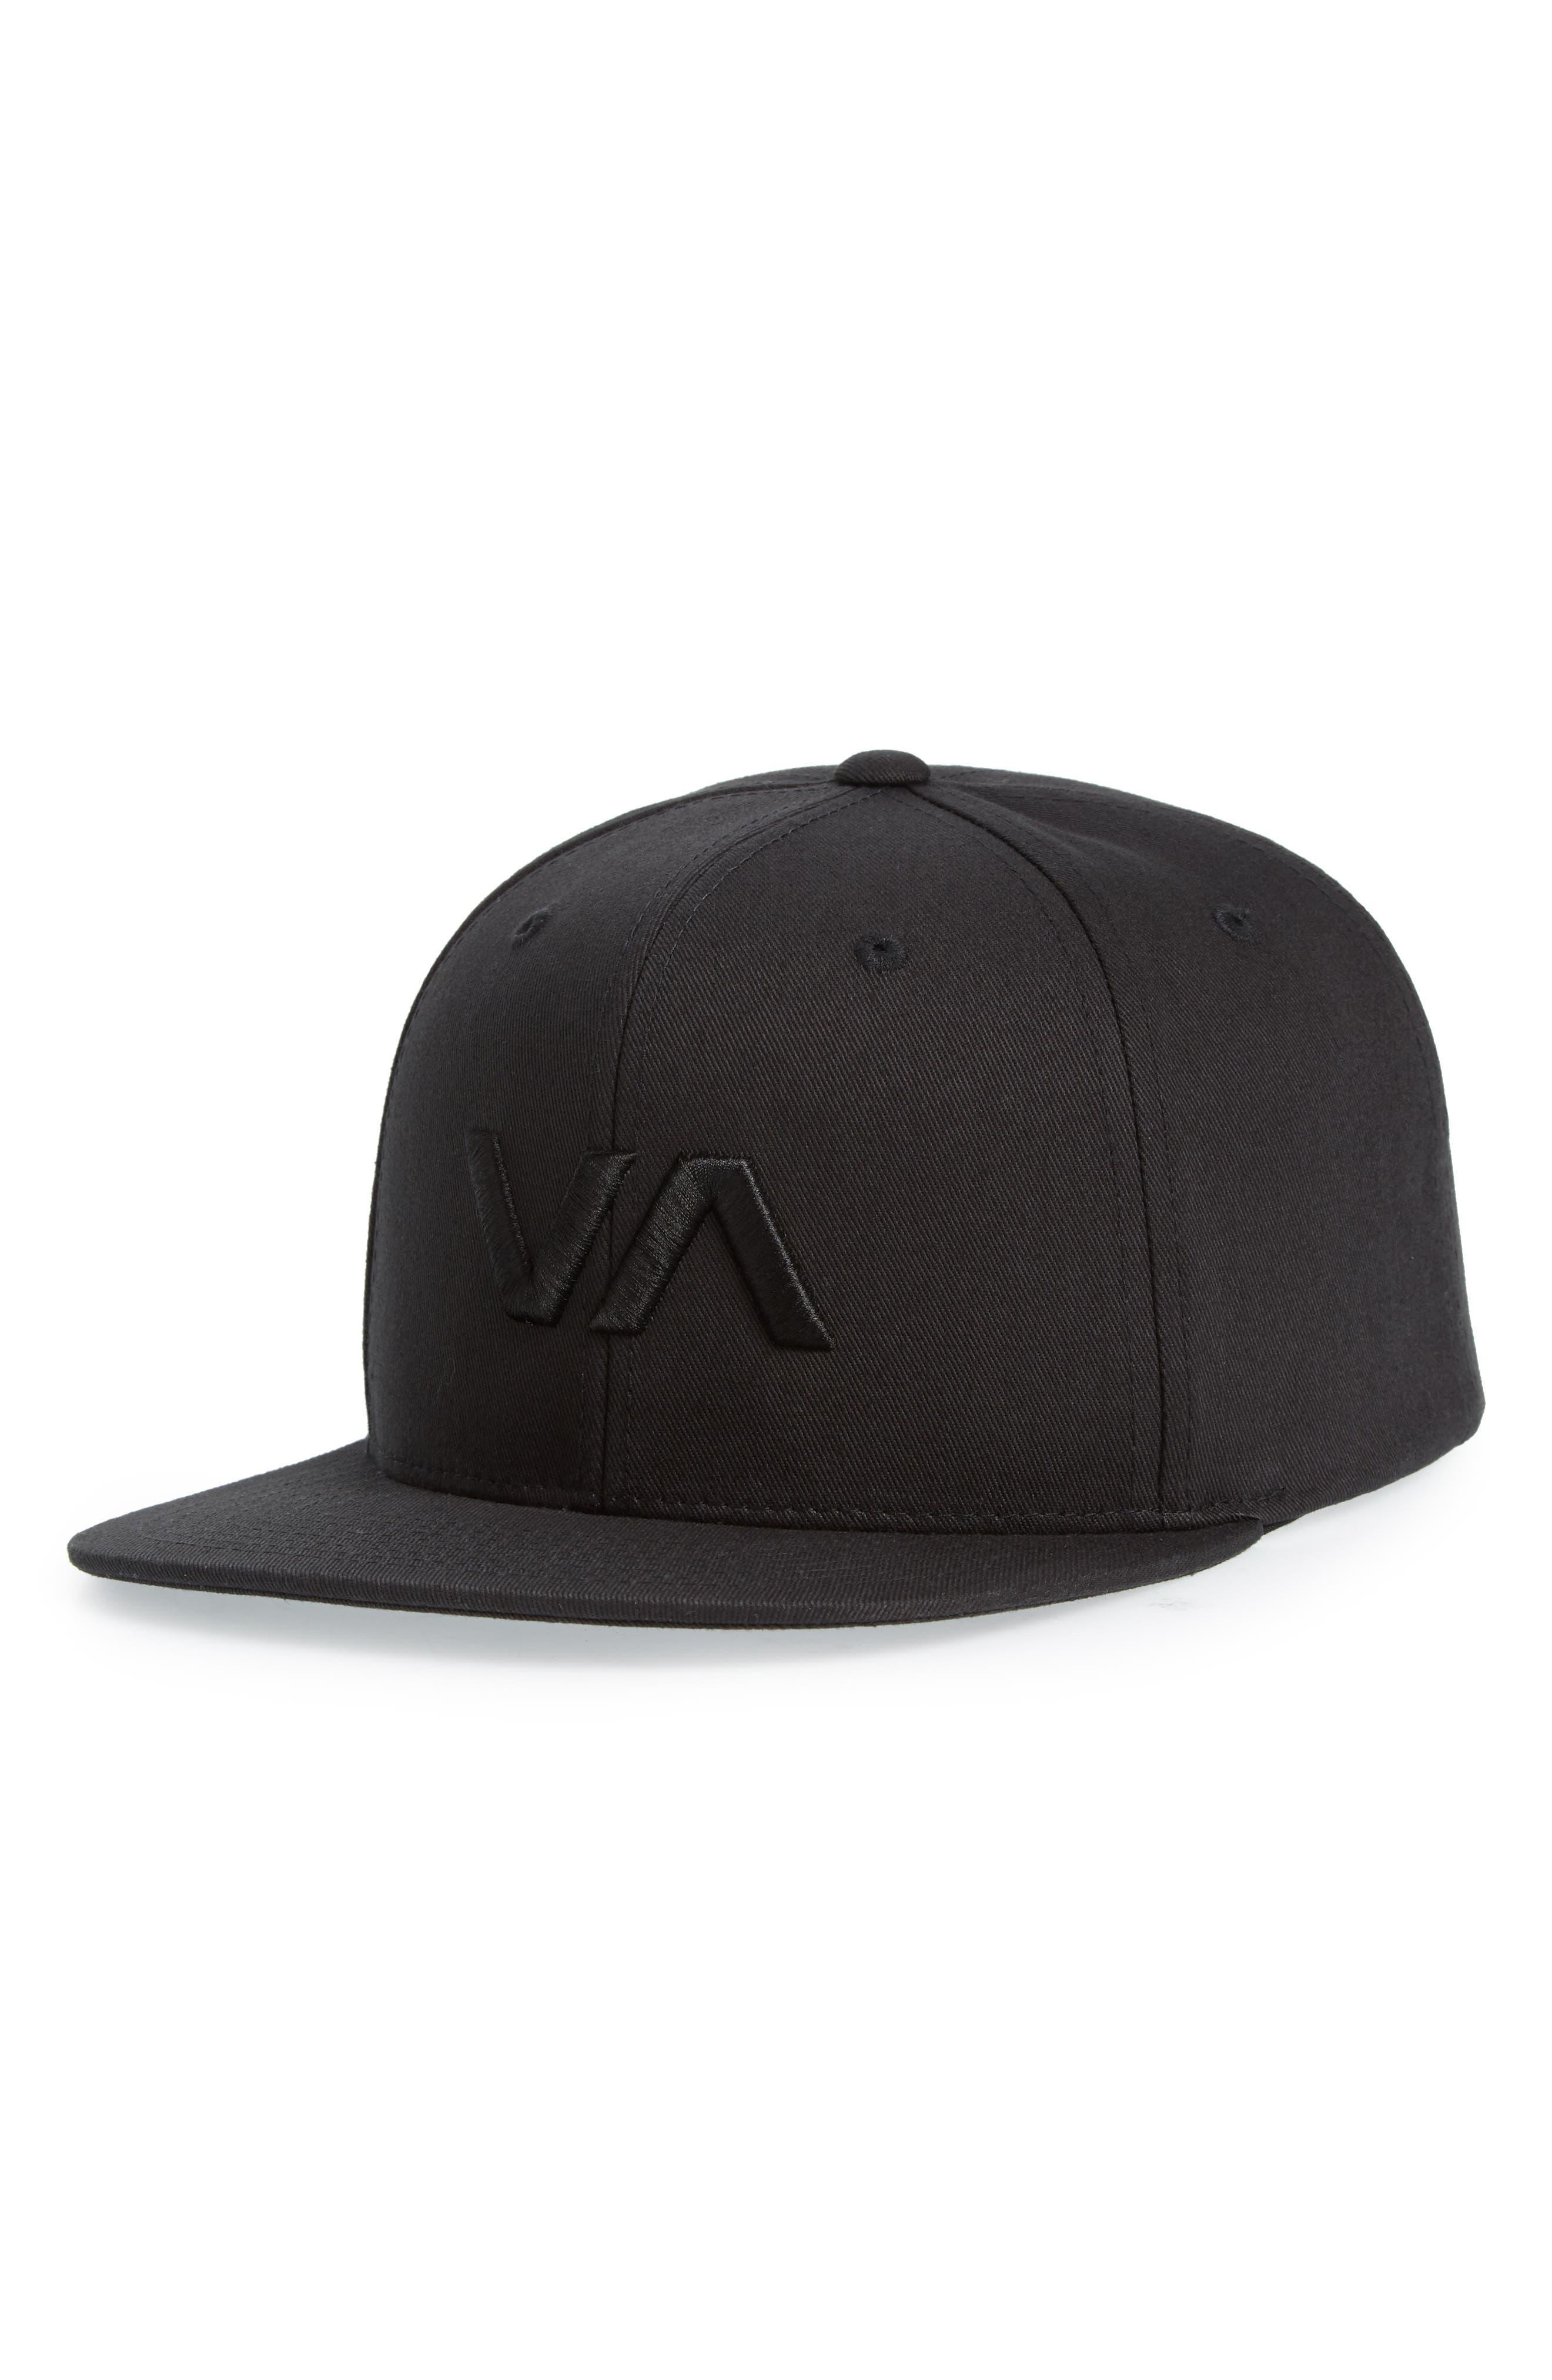 VA Snapback II Snapback Hat,                             Main thumbnail 1, color,                             BLACK/ BLACK